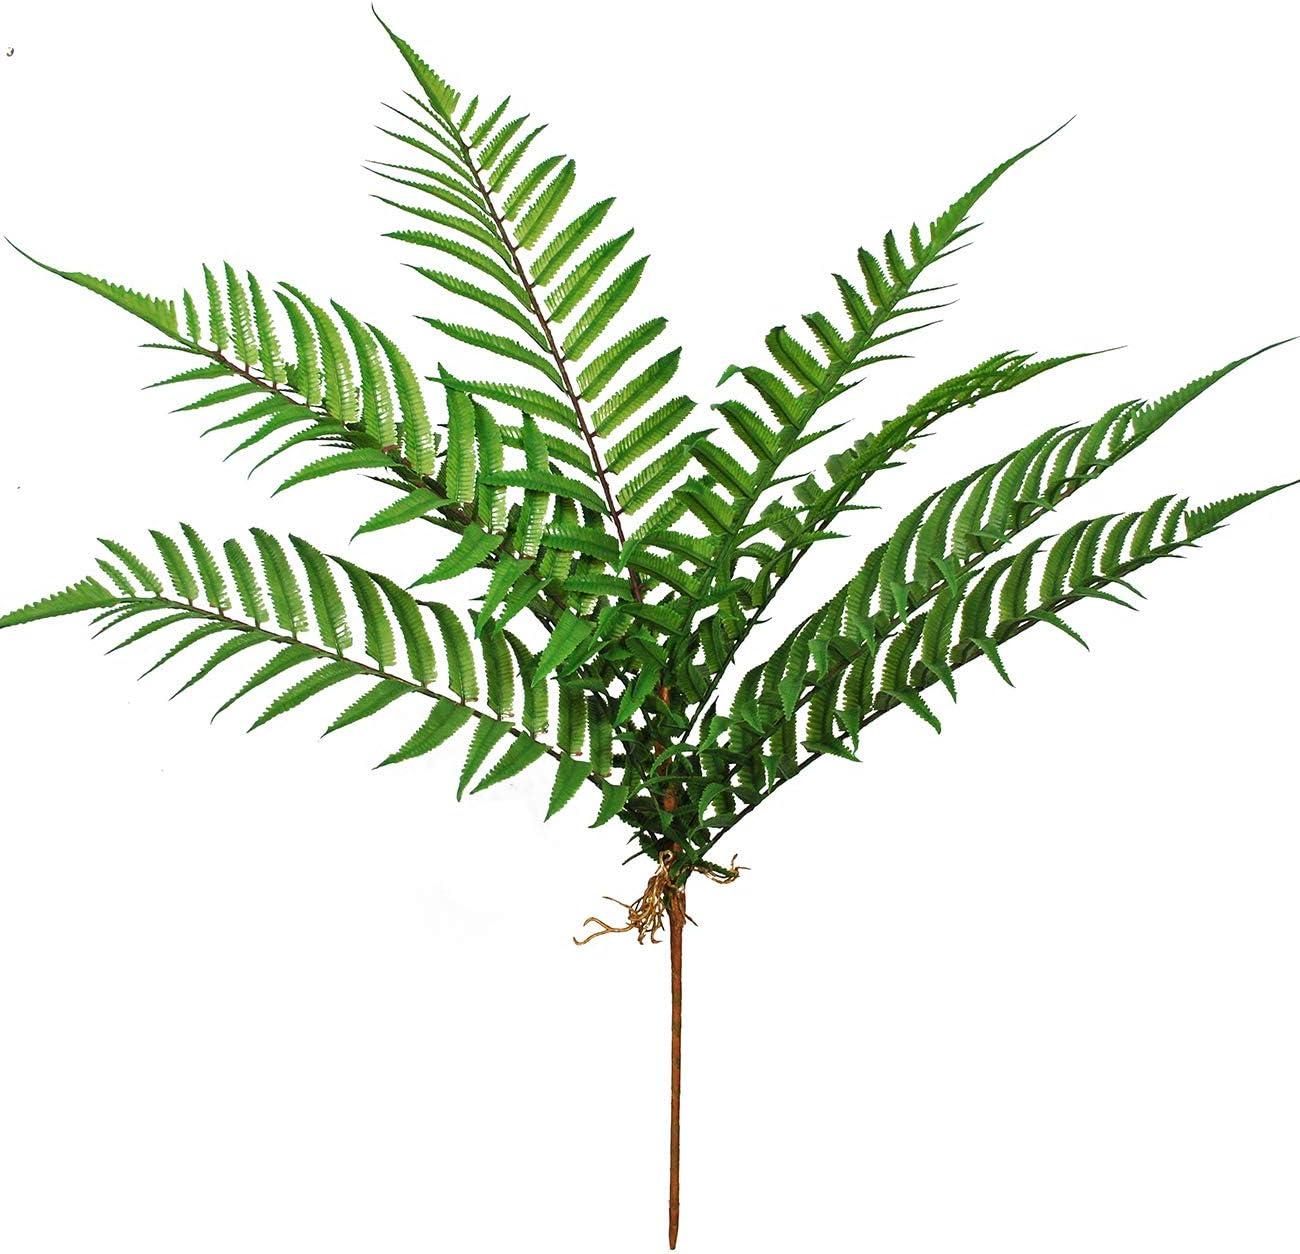 Beebel Artificial Plants Greenery 24